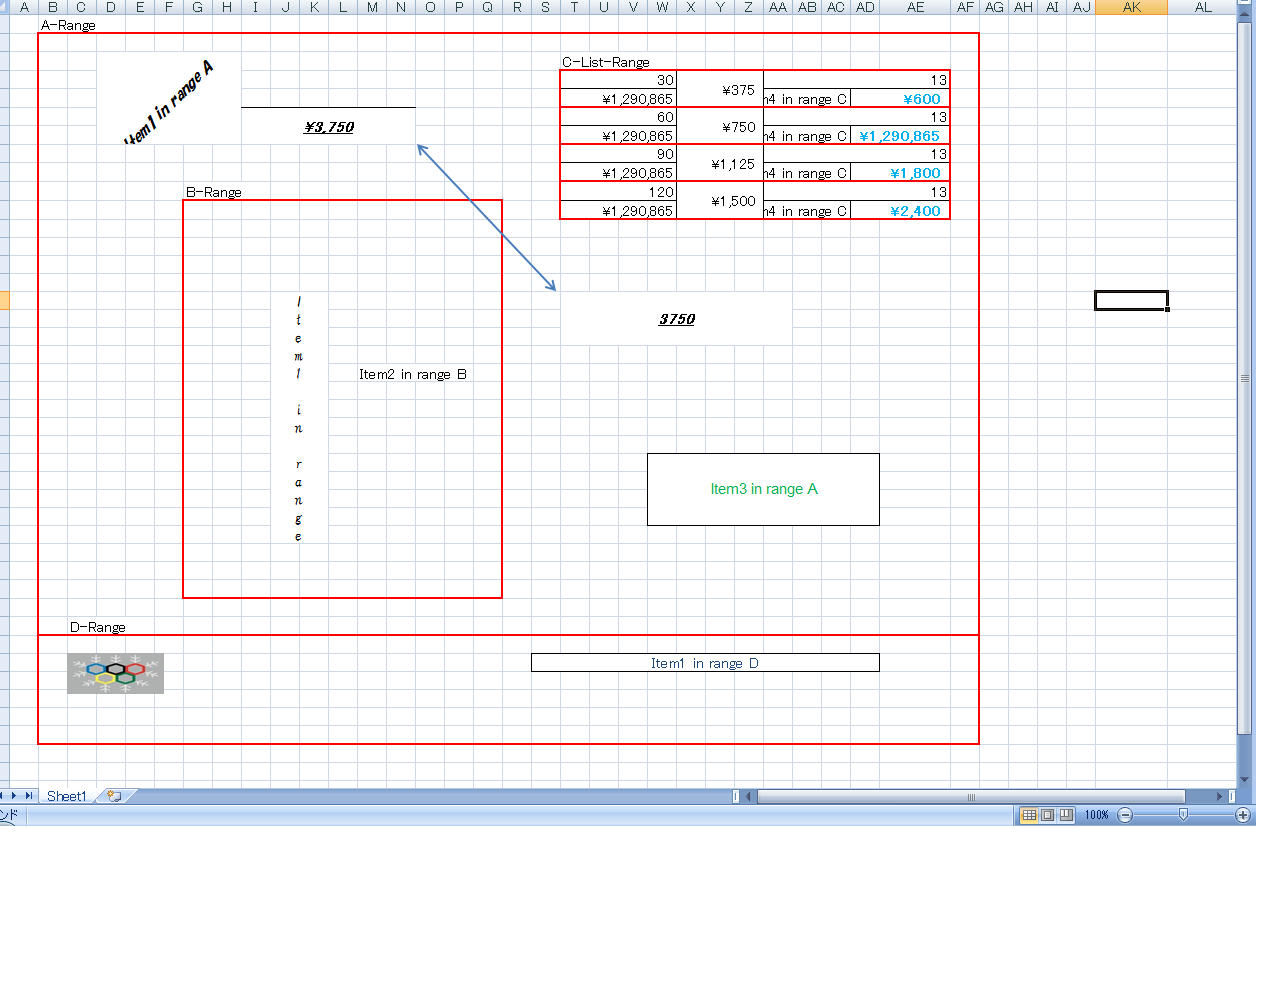 spreadsheet | Excel |OpenXMLジャナ・ビジネス・コンサルティング